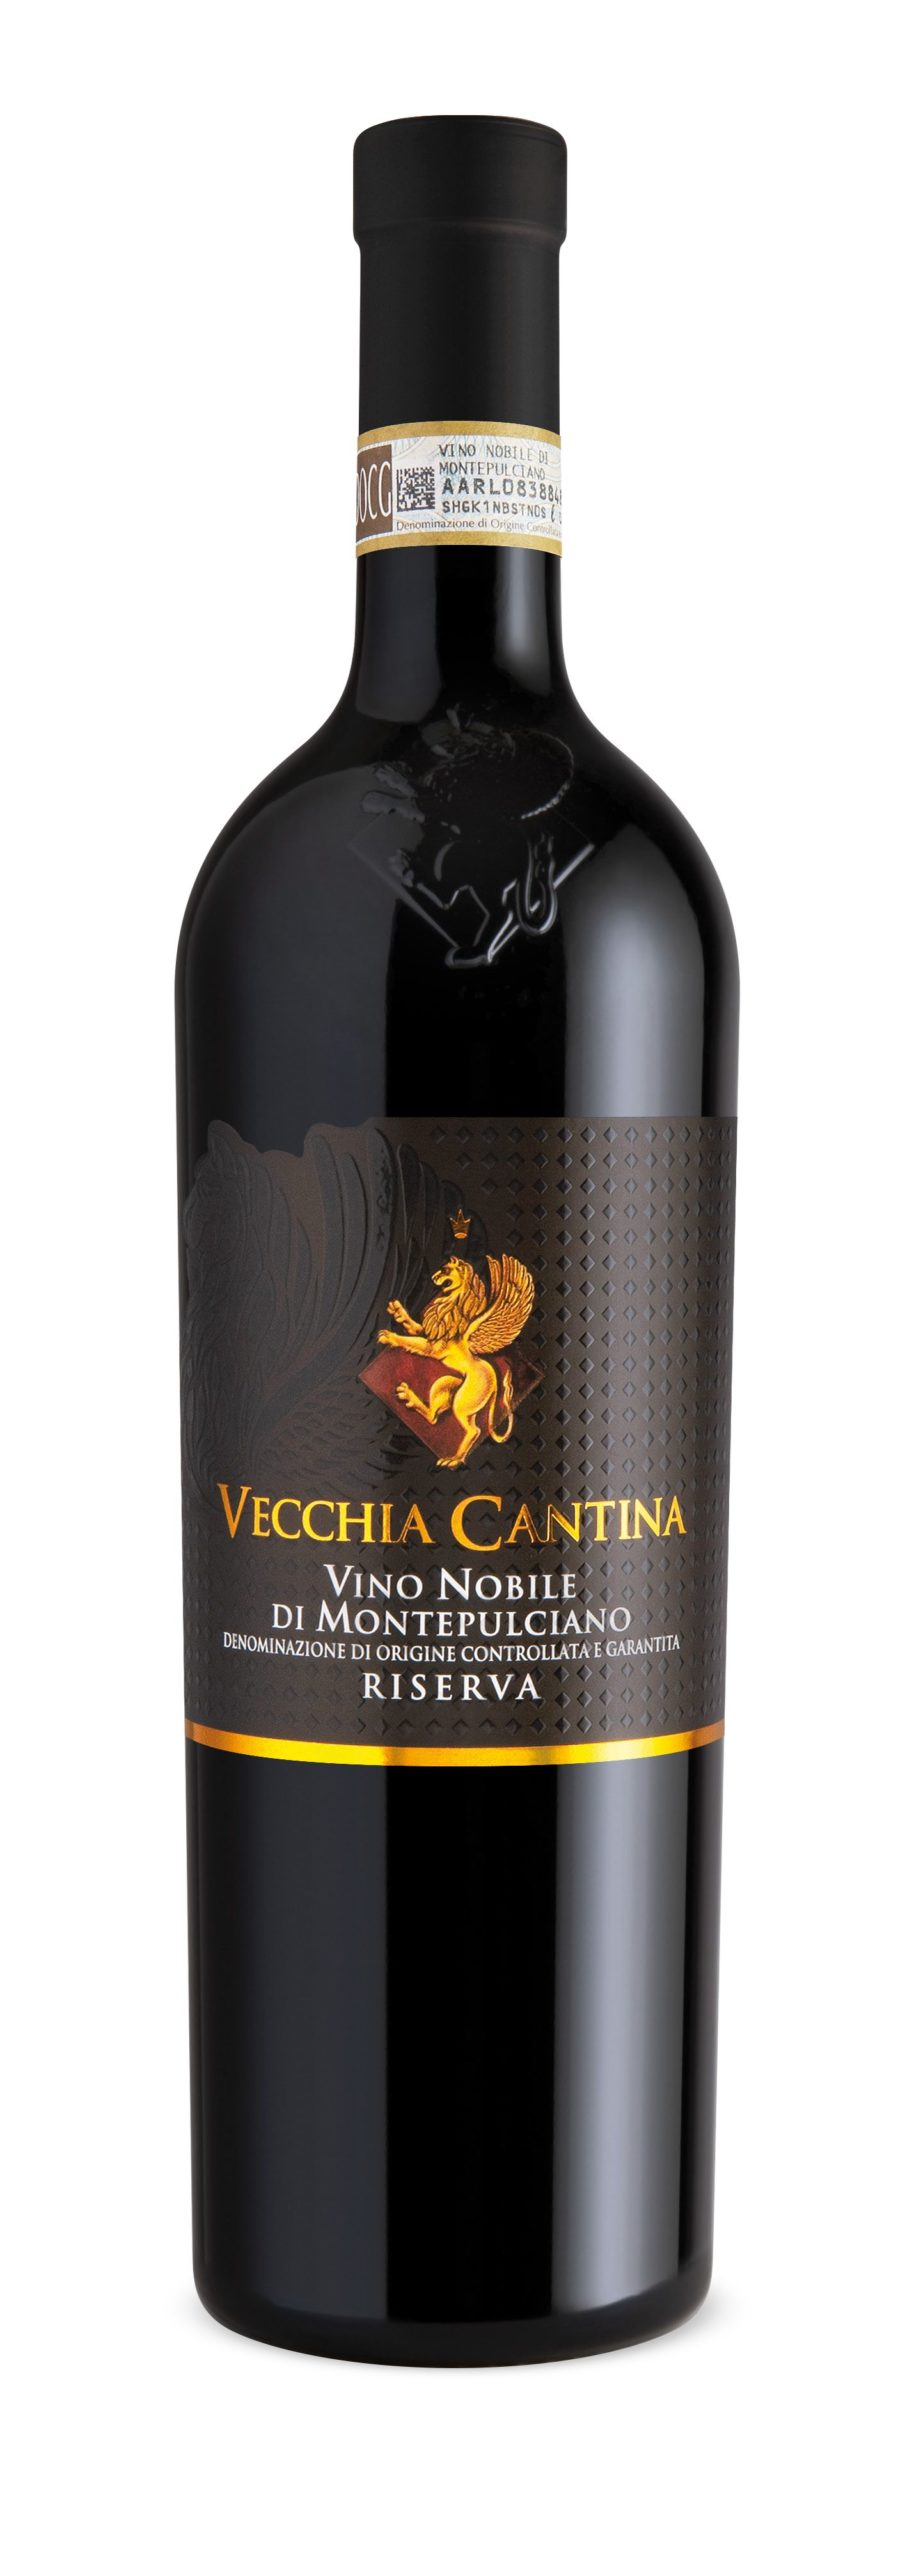 Vino Nobile di Montepulciano DOCG TOSCANA Riserva